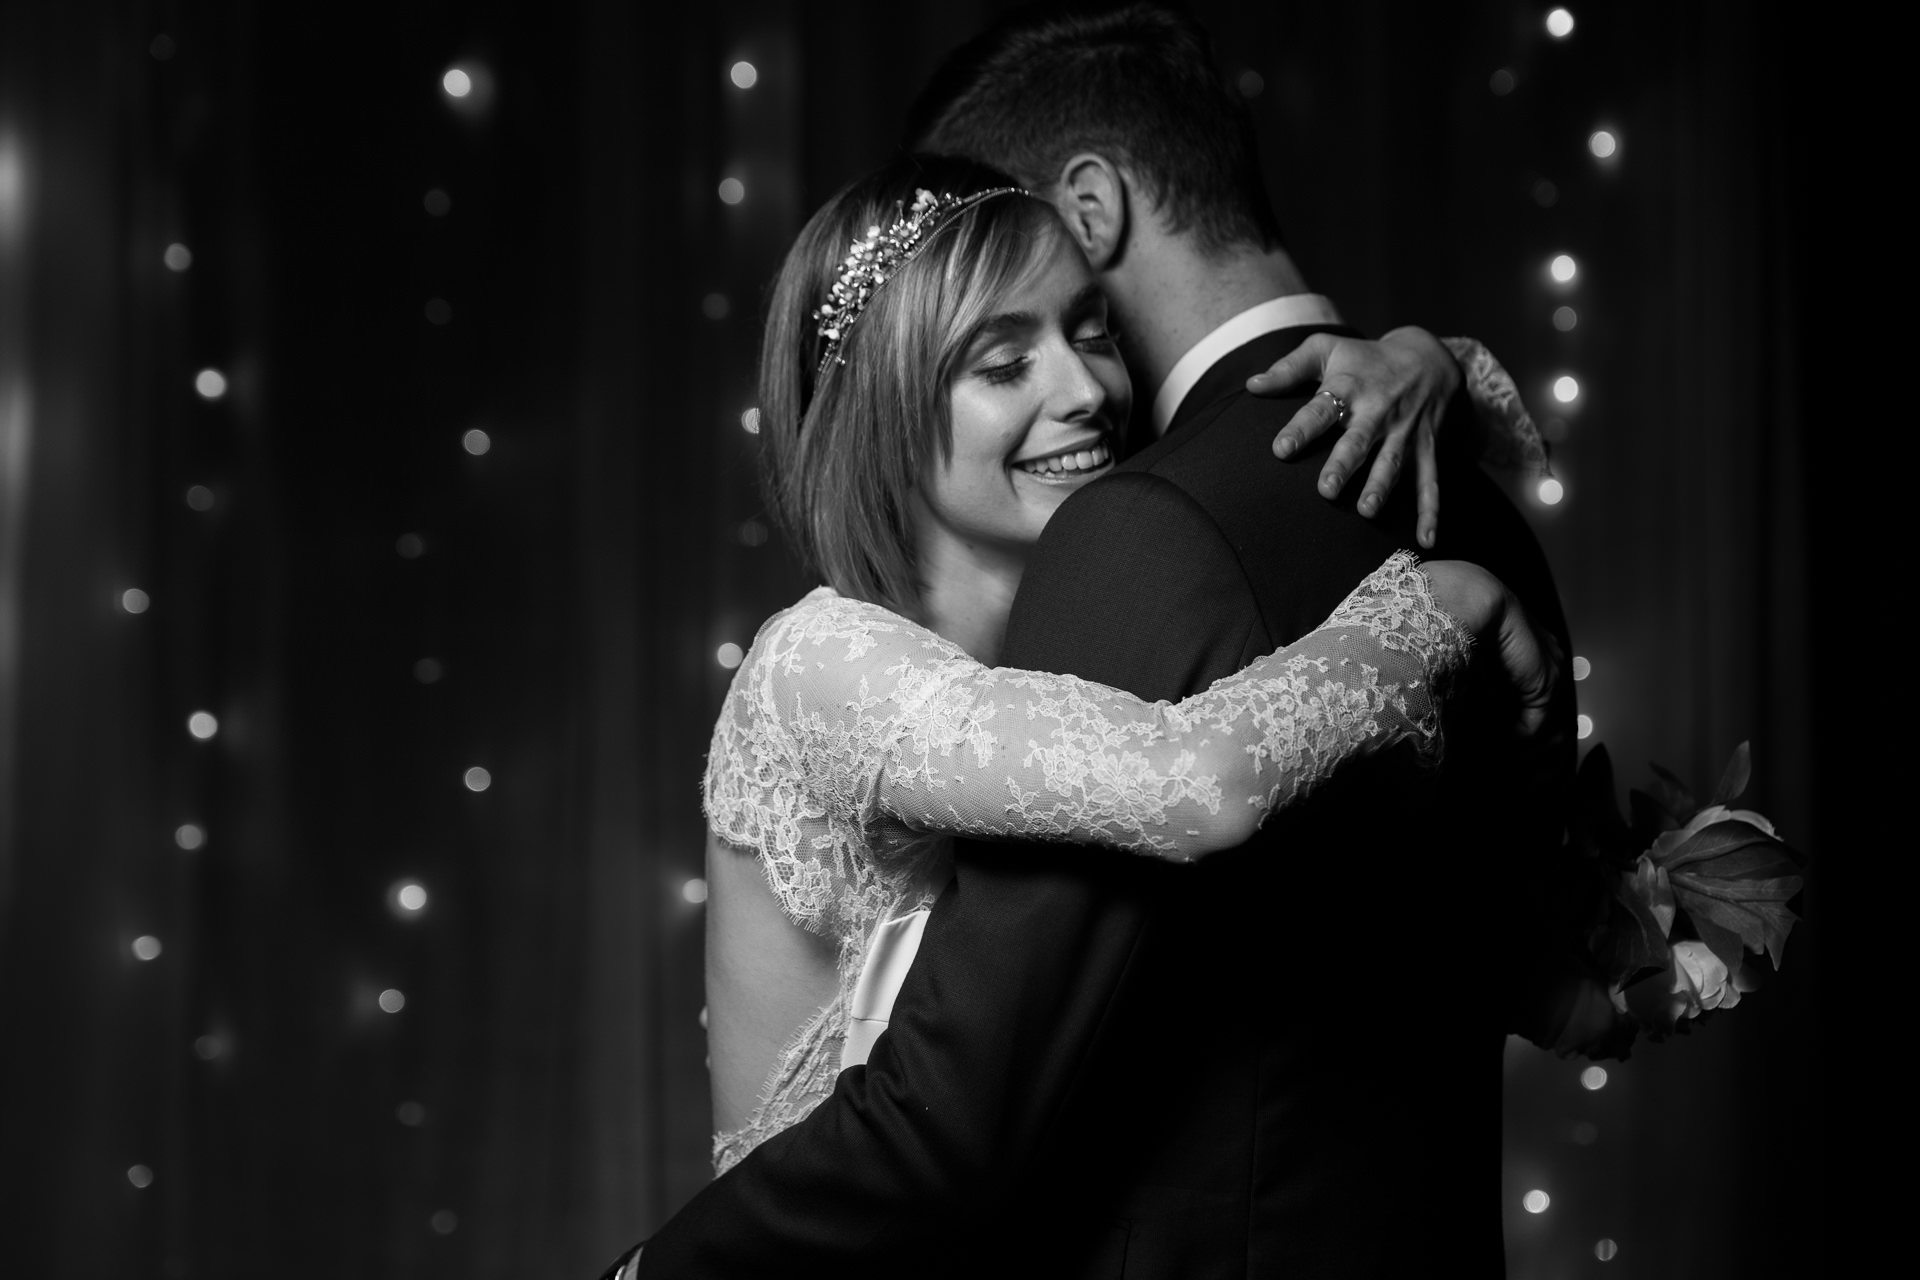 Splendide wedding photographe mariage val de marne romain et laura-6